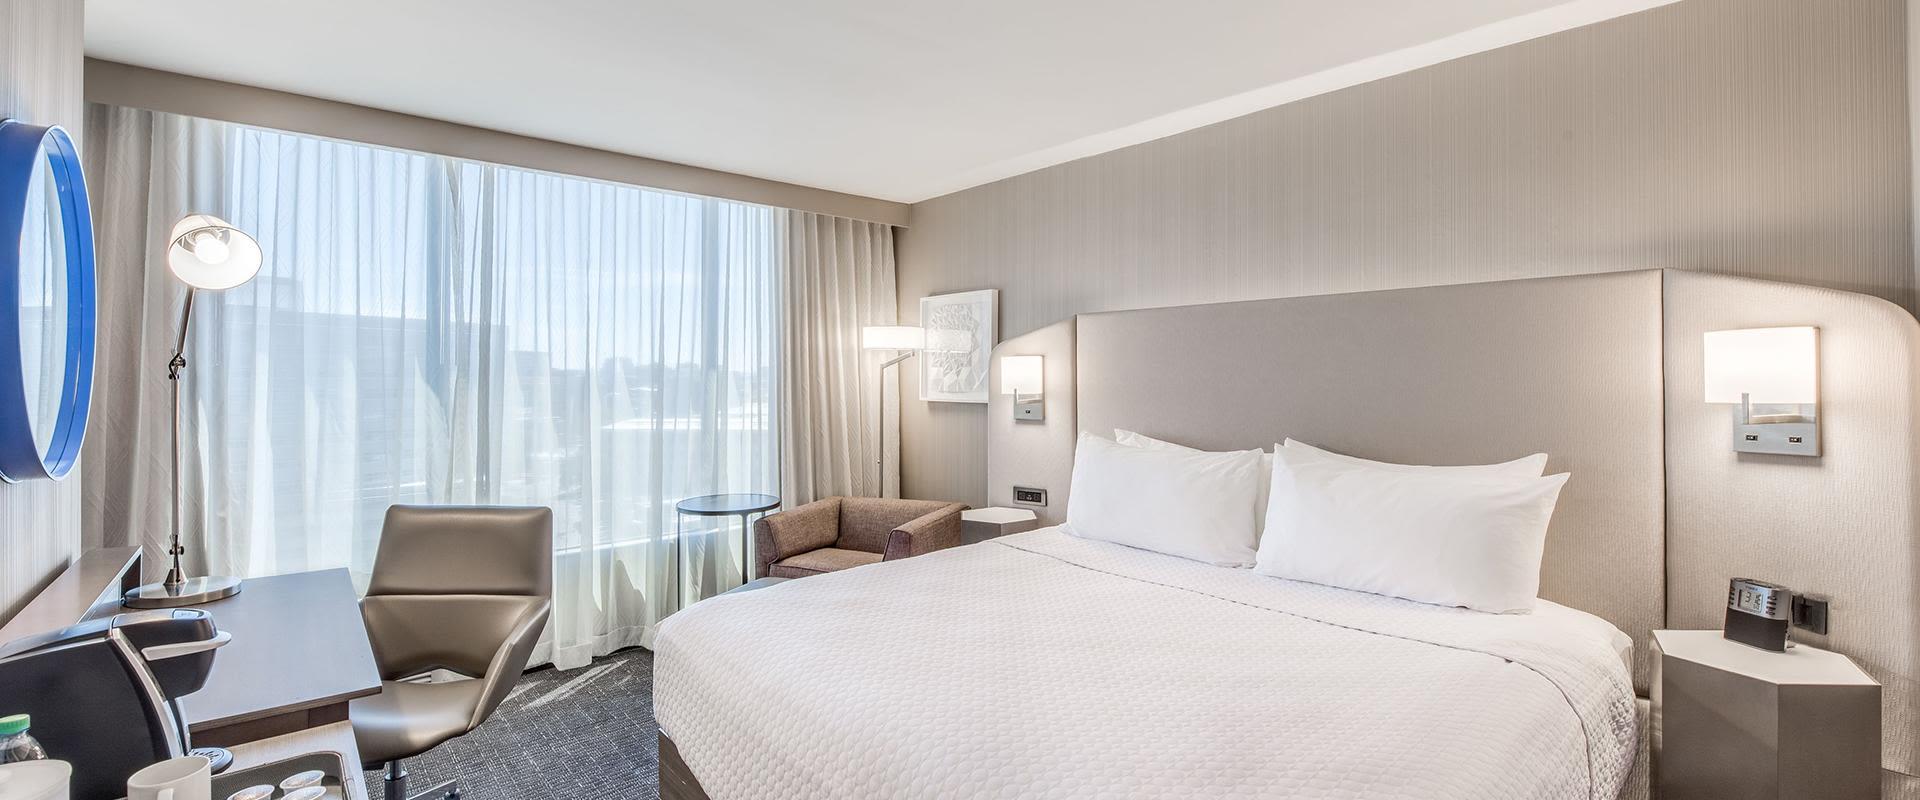 Denver Room With Queen Bed